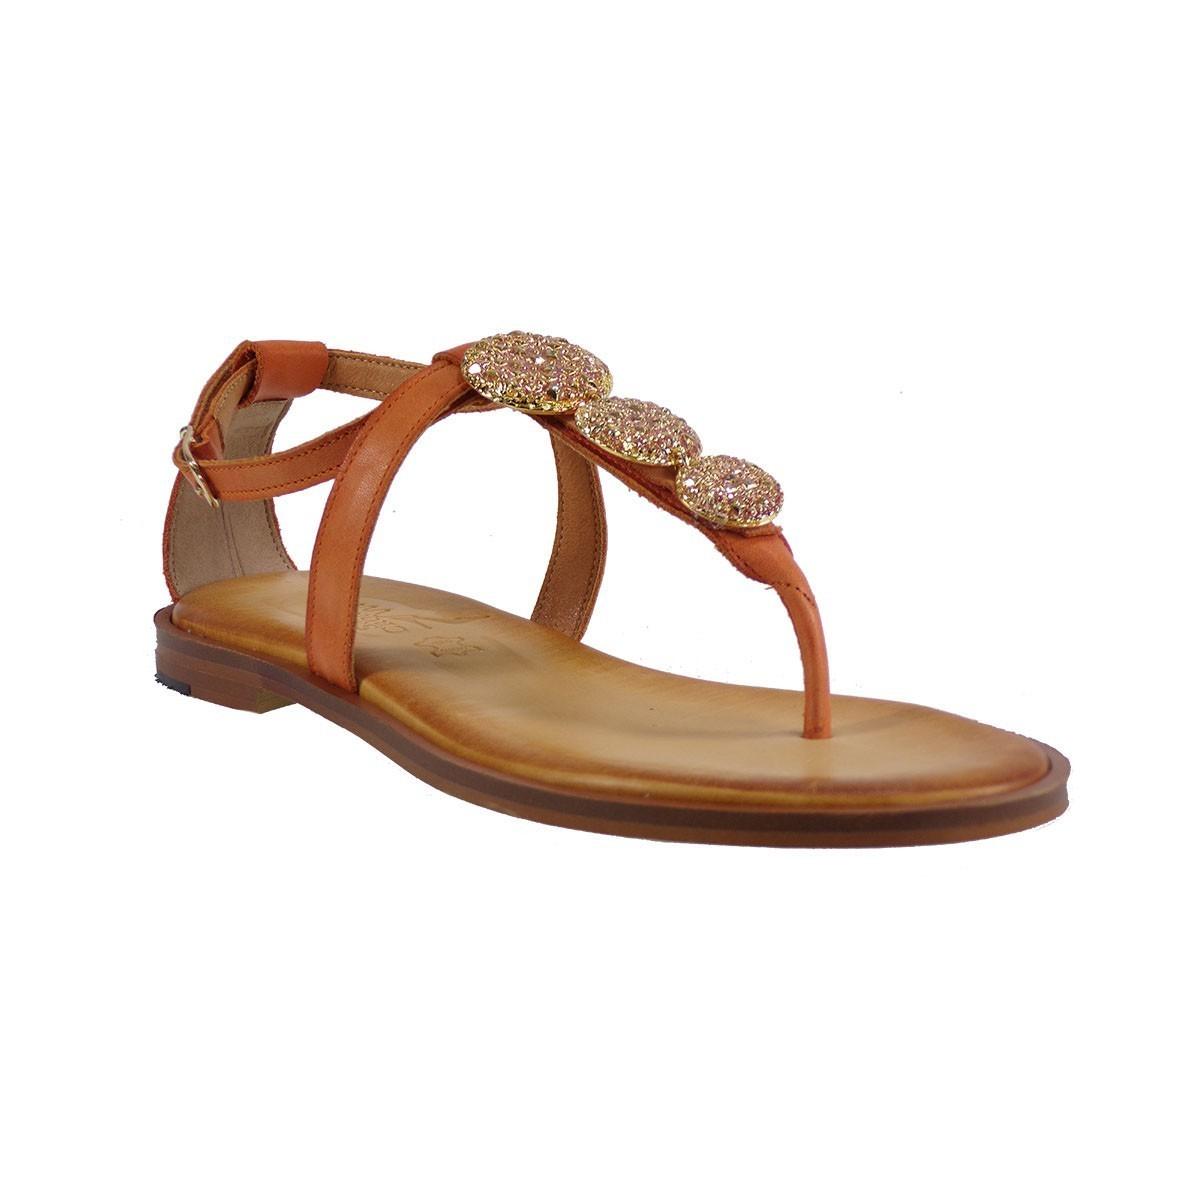 Smart Cronos Γυναικεία Παπούτσια Πέδιλα 6894-1991 Πορτοκαλί Δέρμα